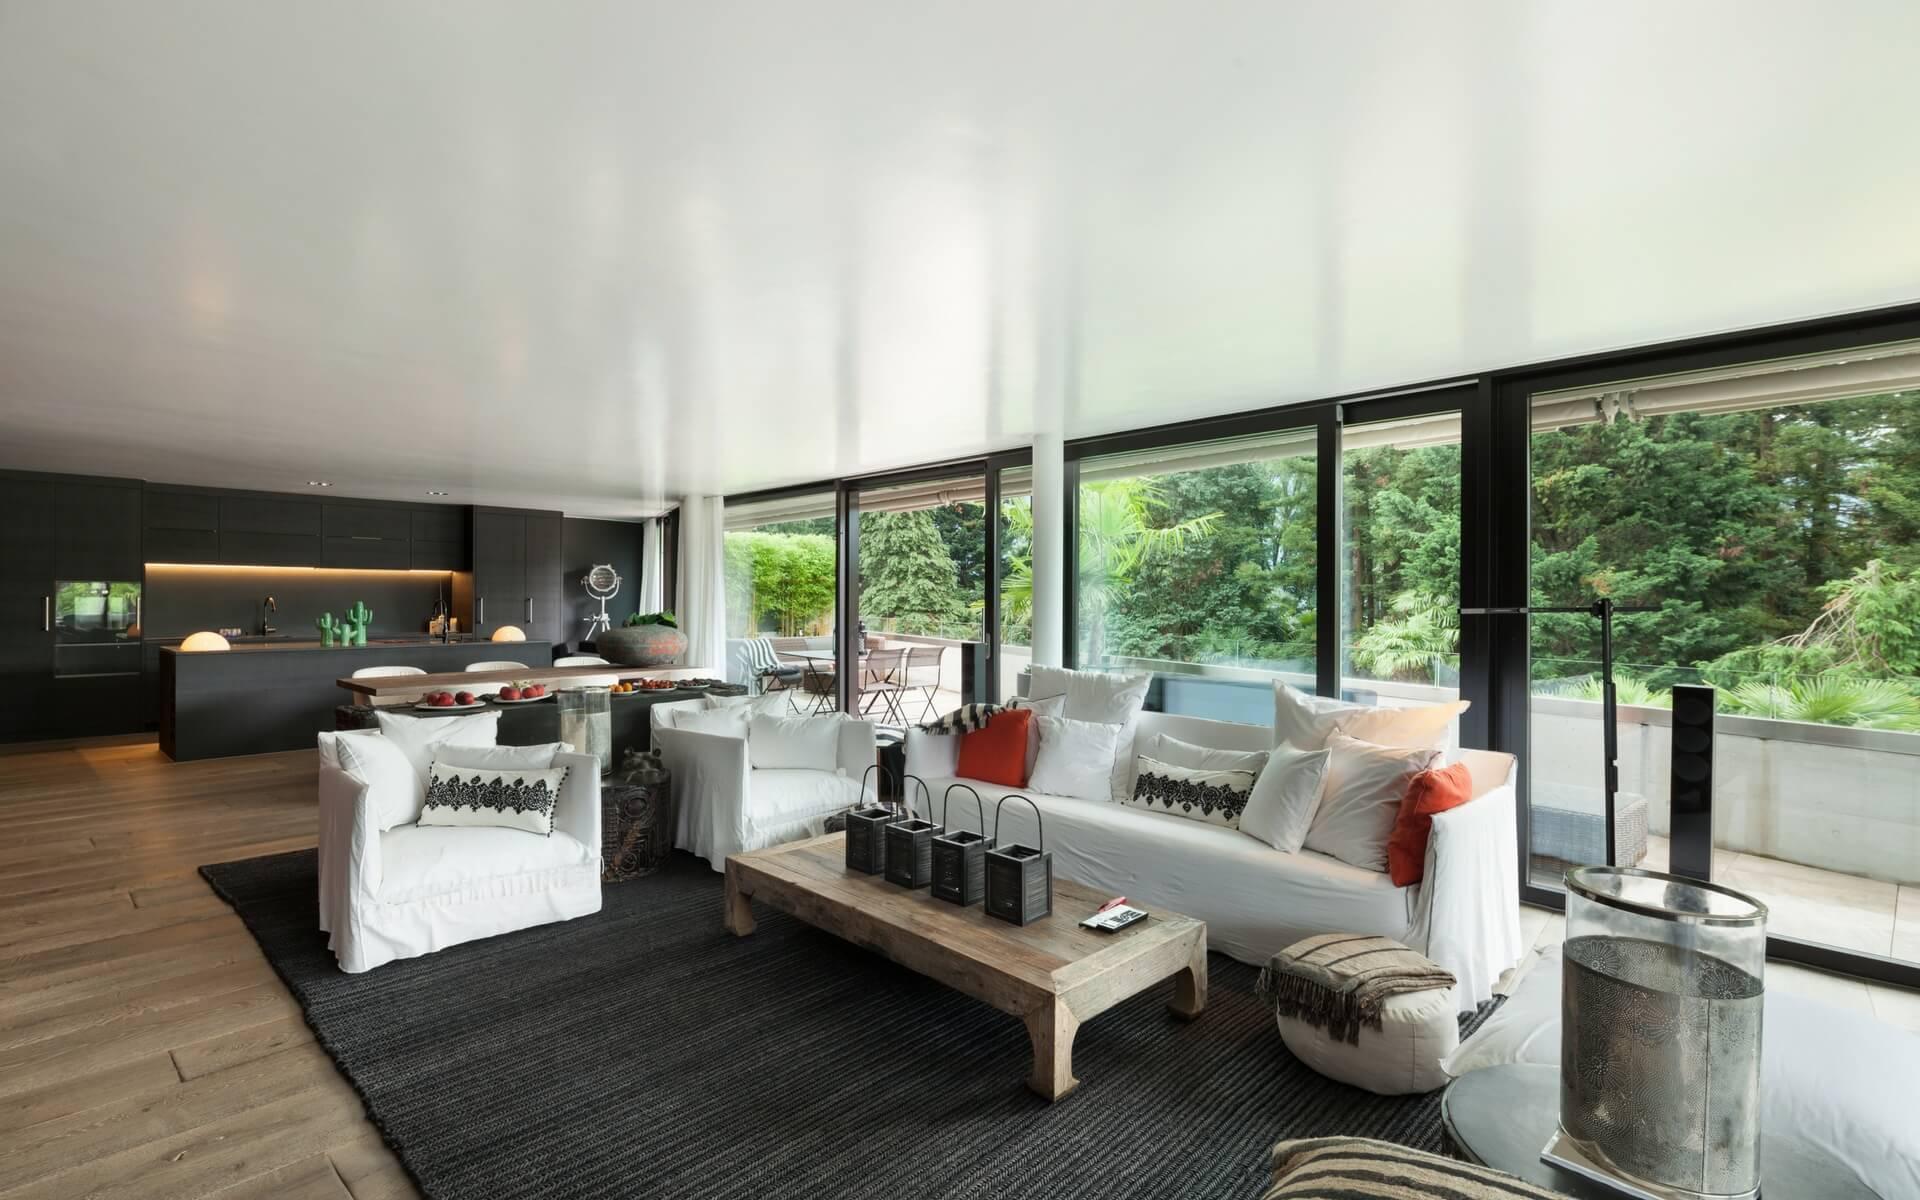 Arredare Sala Da Pranzo Moderna : Design moderno: quando la creatività è di casa blog oknoplast